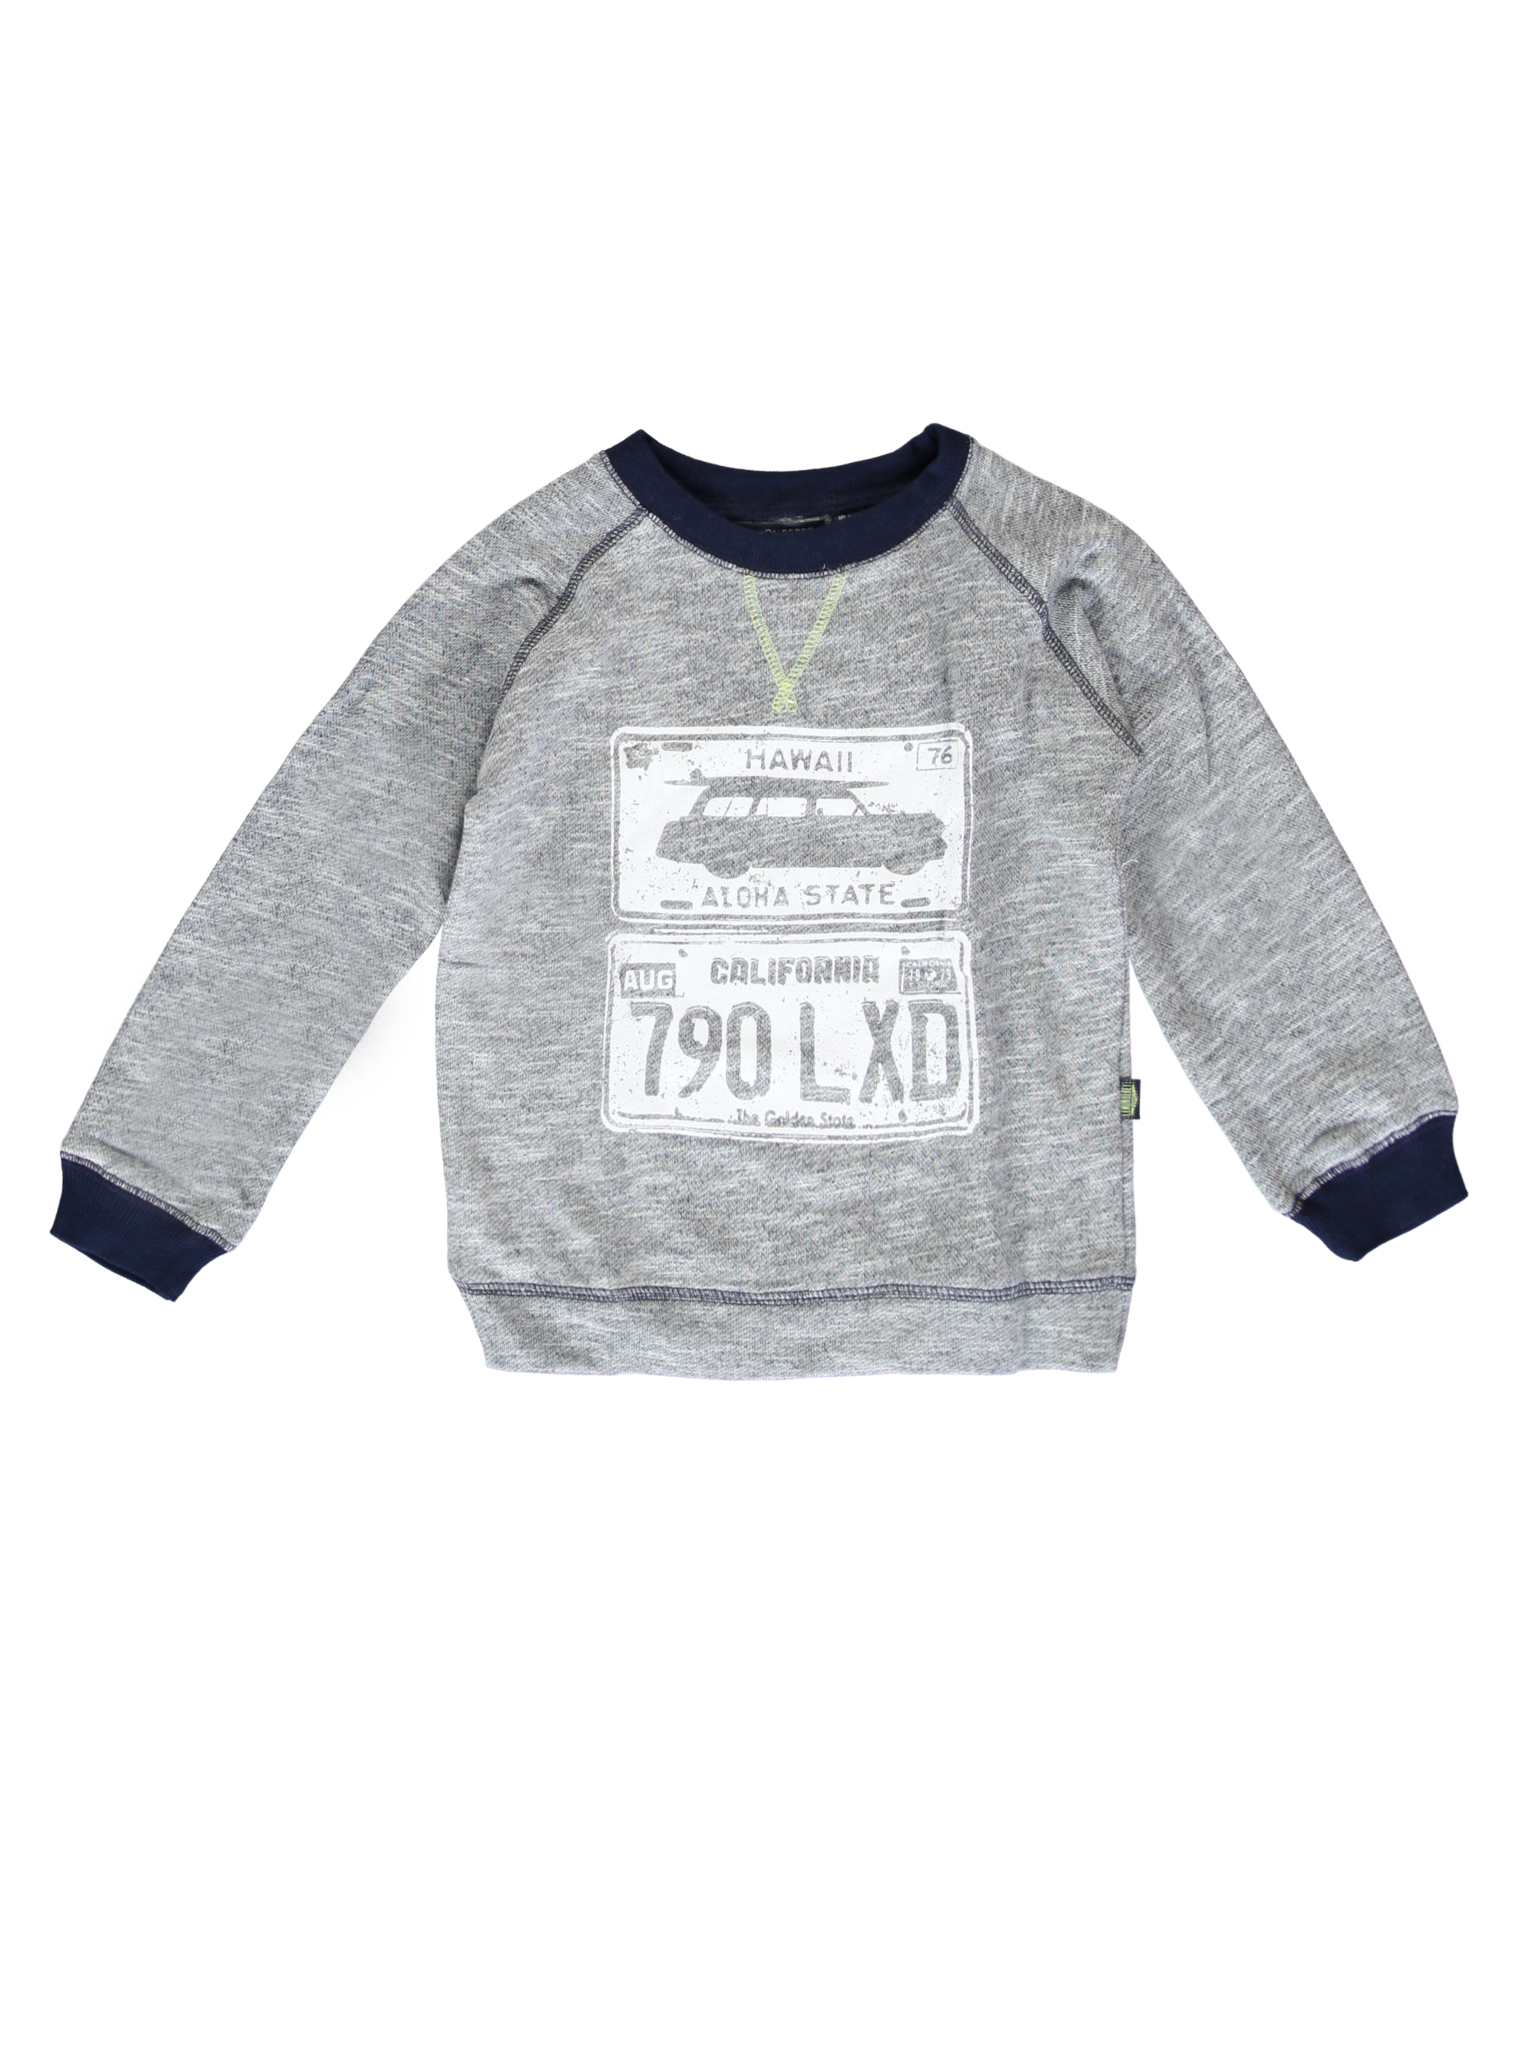 All Brands | Summerproducts Small Boys | Sweatshirt | 10 pcs/box